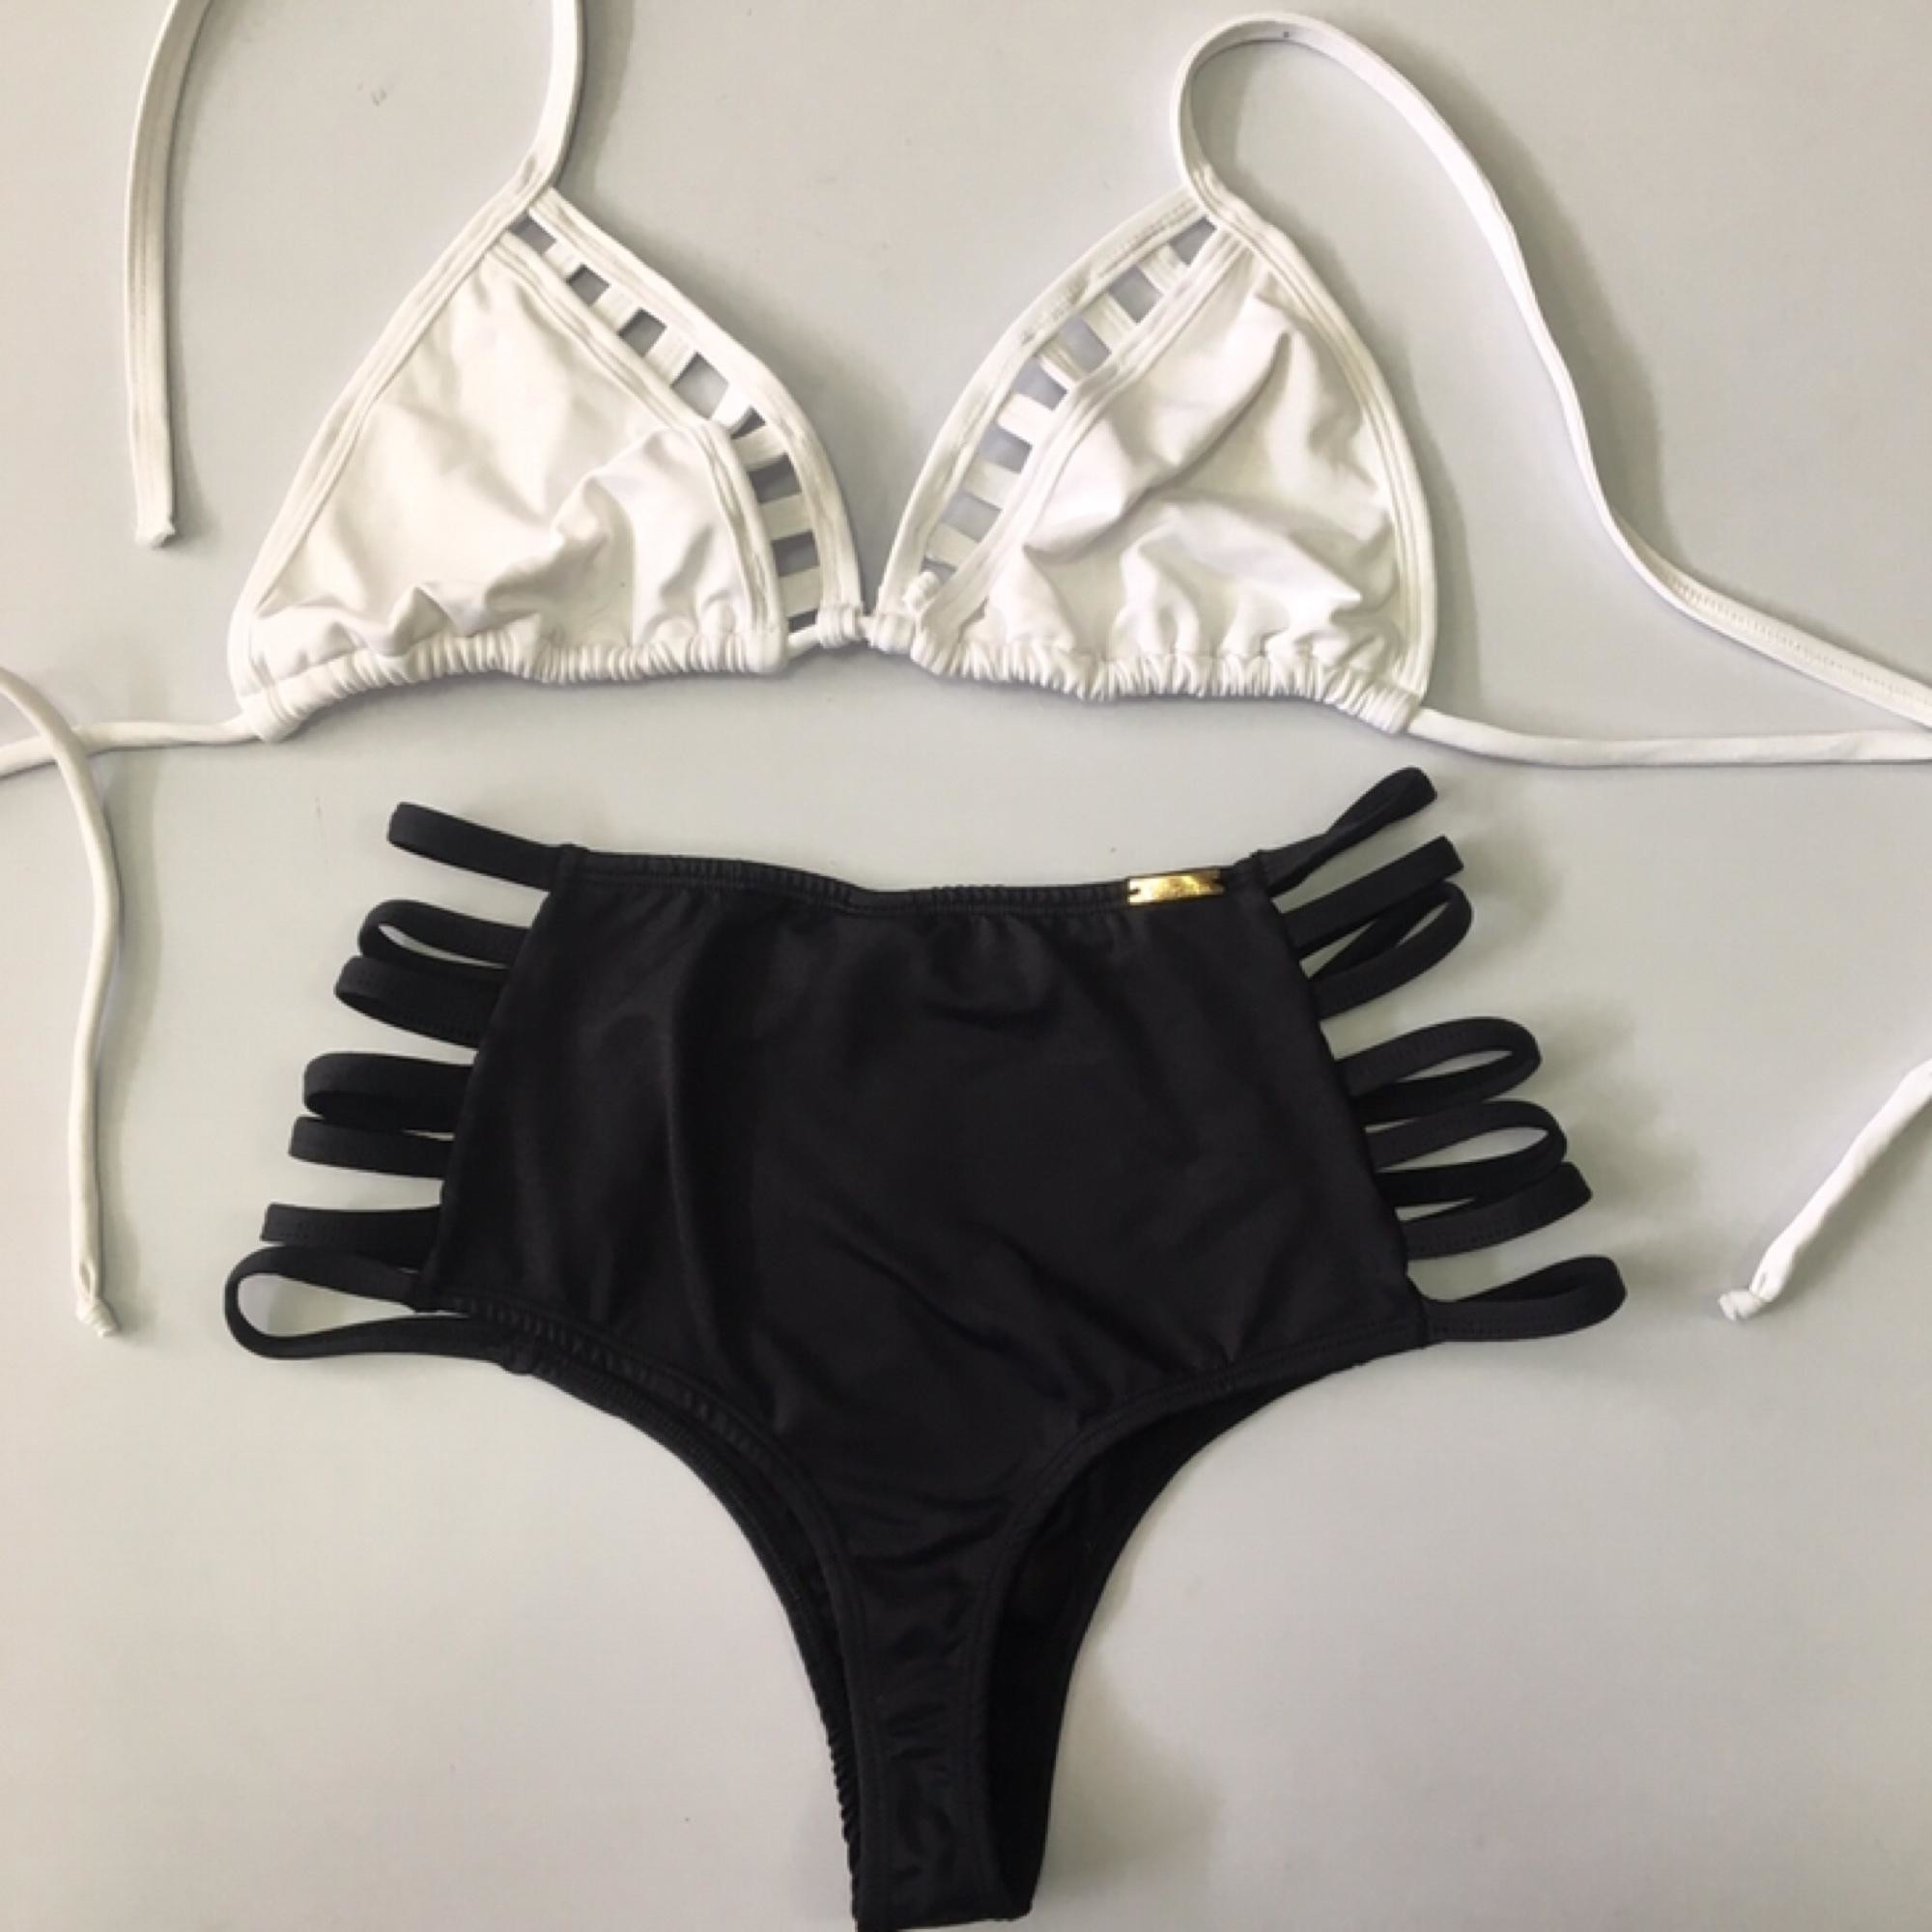 cd862ba89cf2 Biquini Hot pants Cintura Alta de tiras no Elo7   Melthan Lingerie e Moda  Praia Personalizados (DBB5CC)